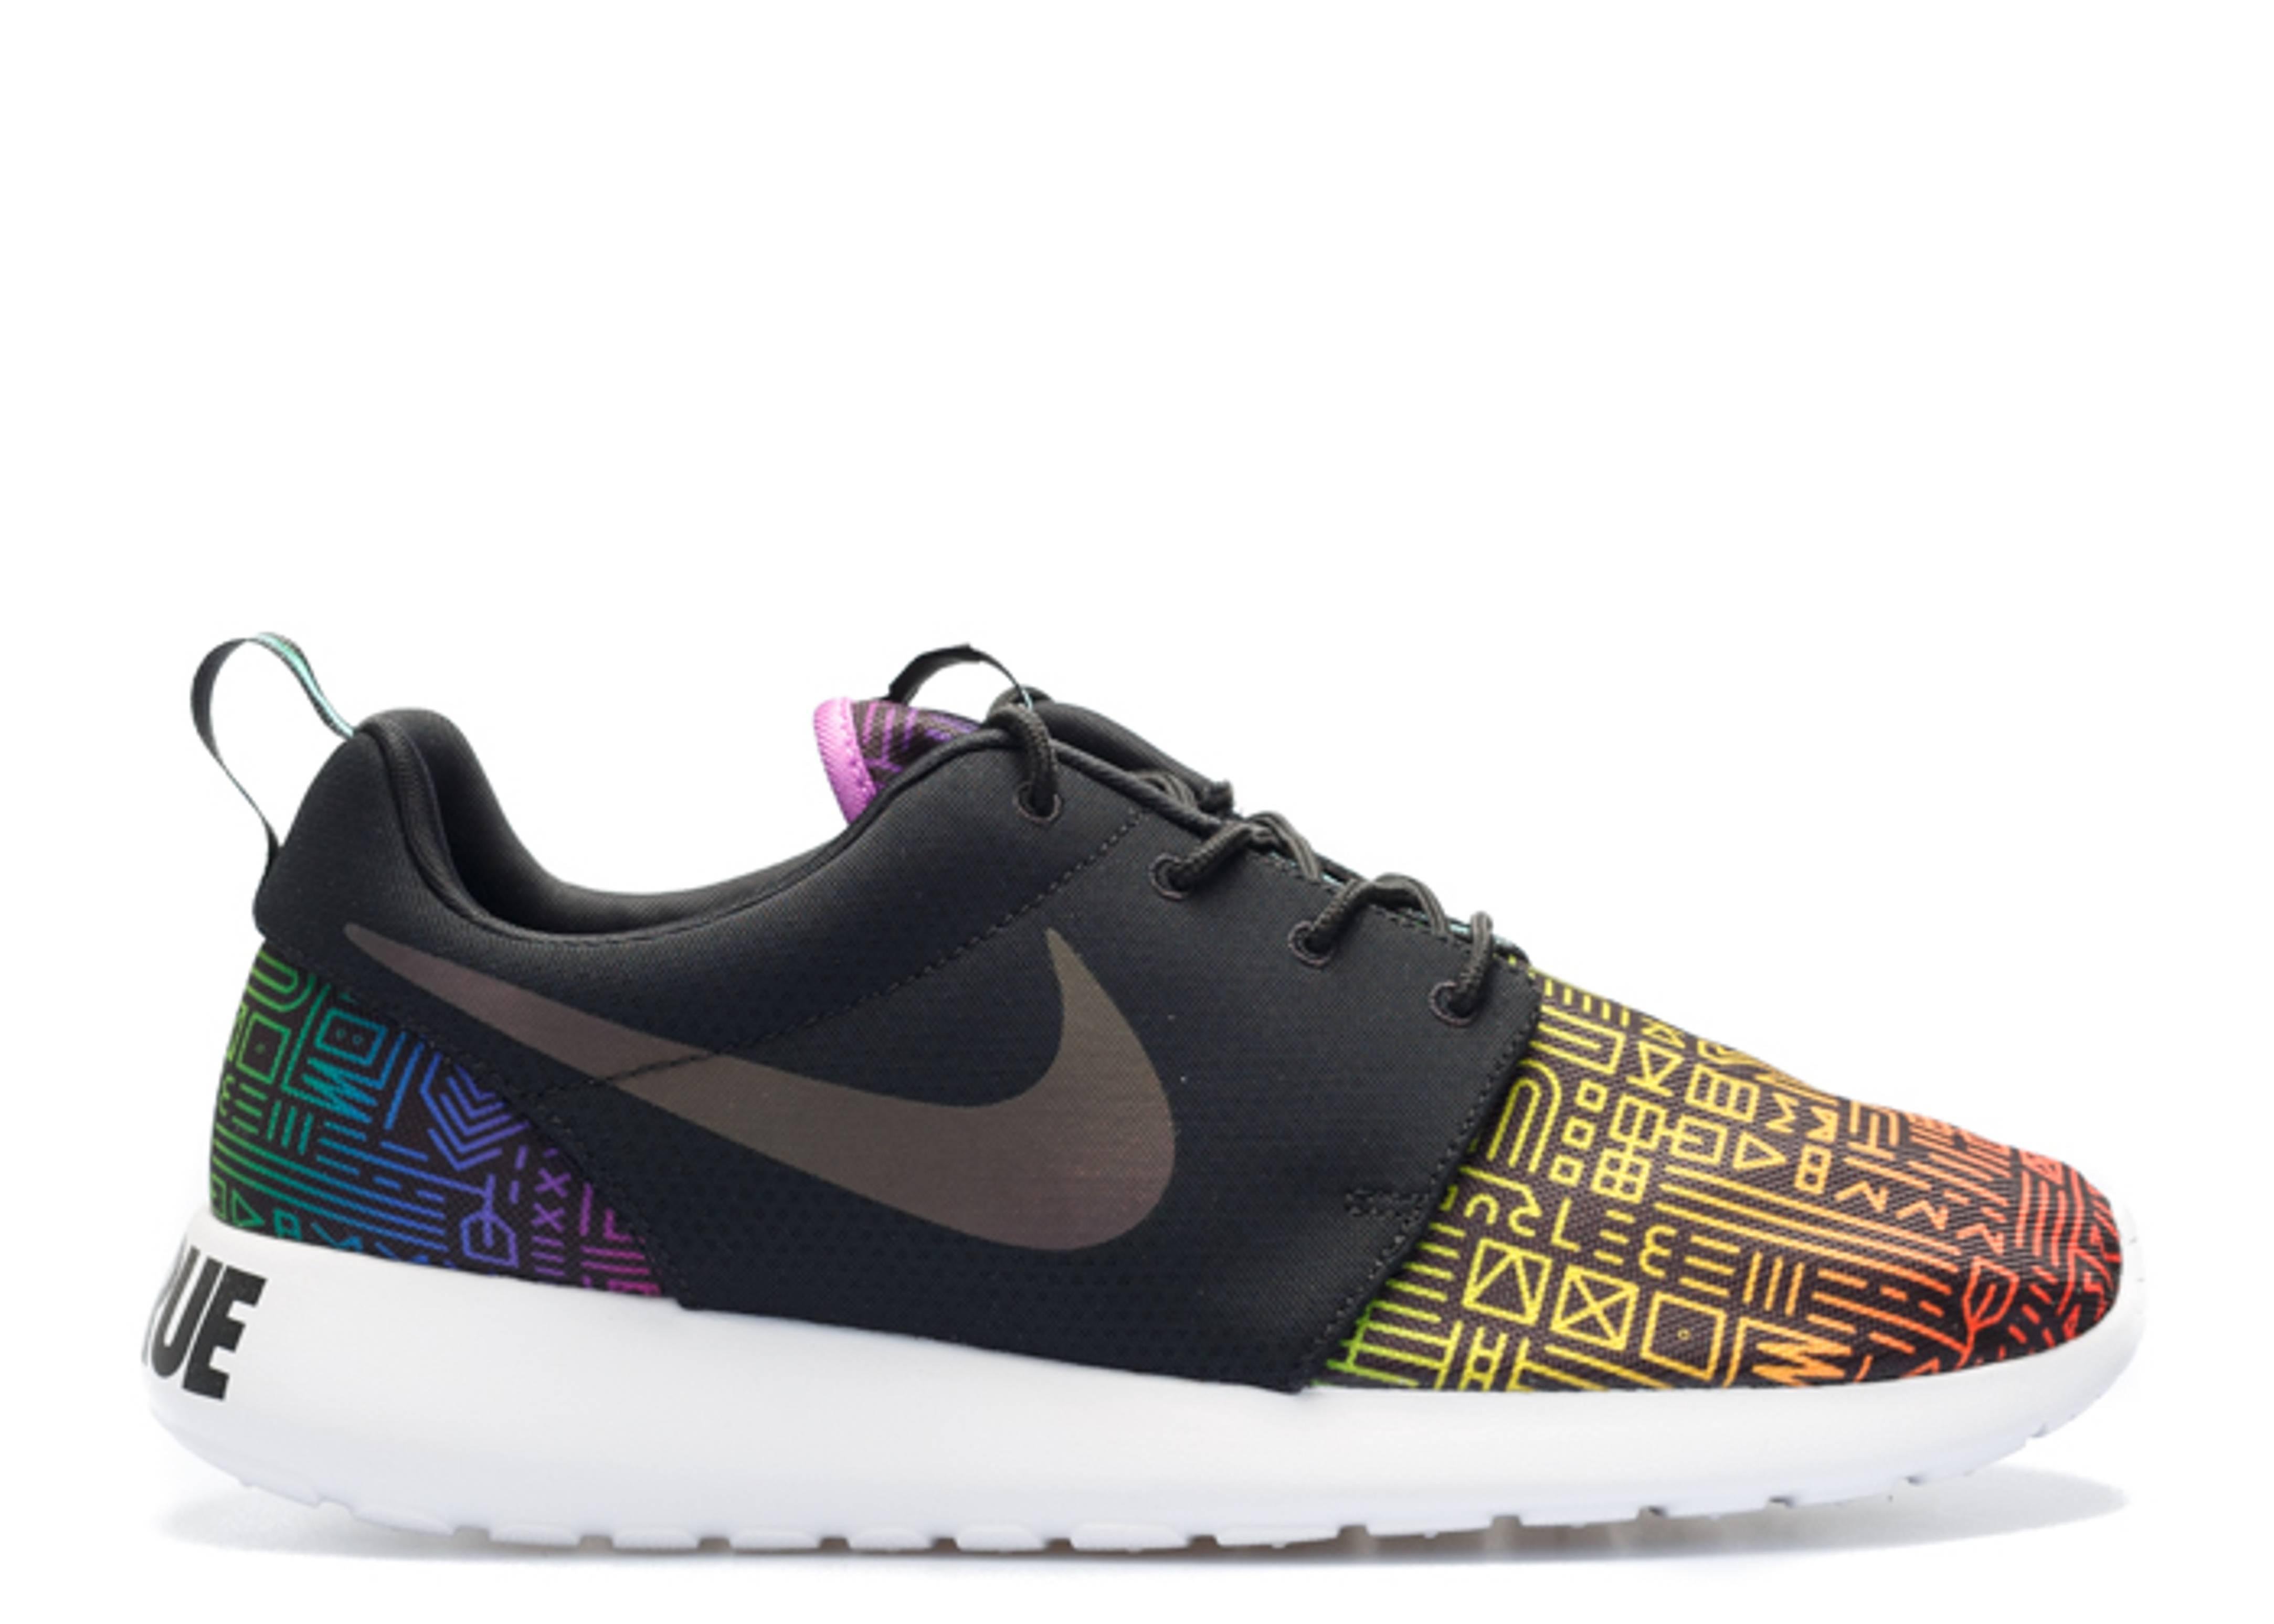 Shop: Nike Roshe Run Be True | Kixify Marketplace